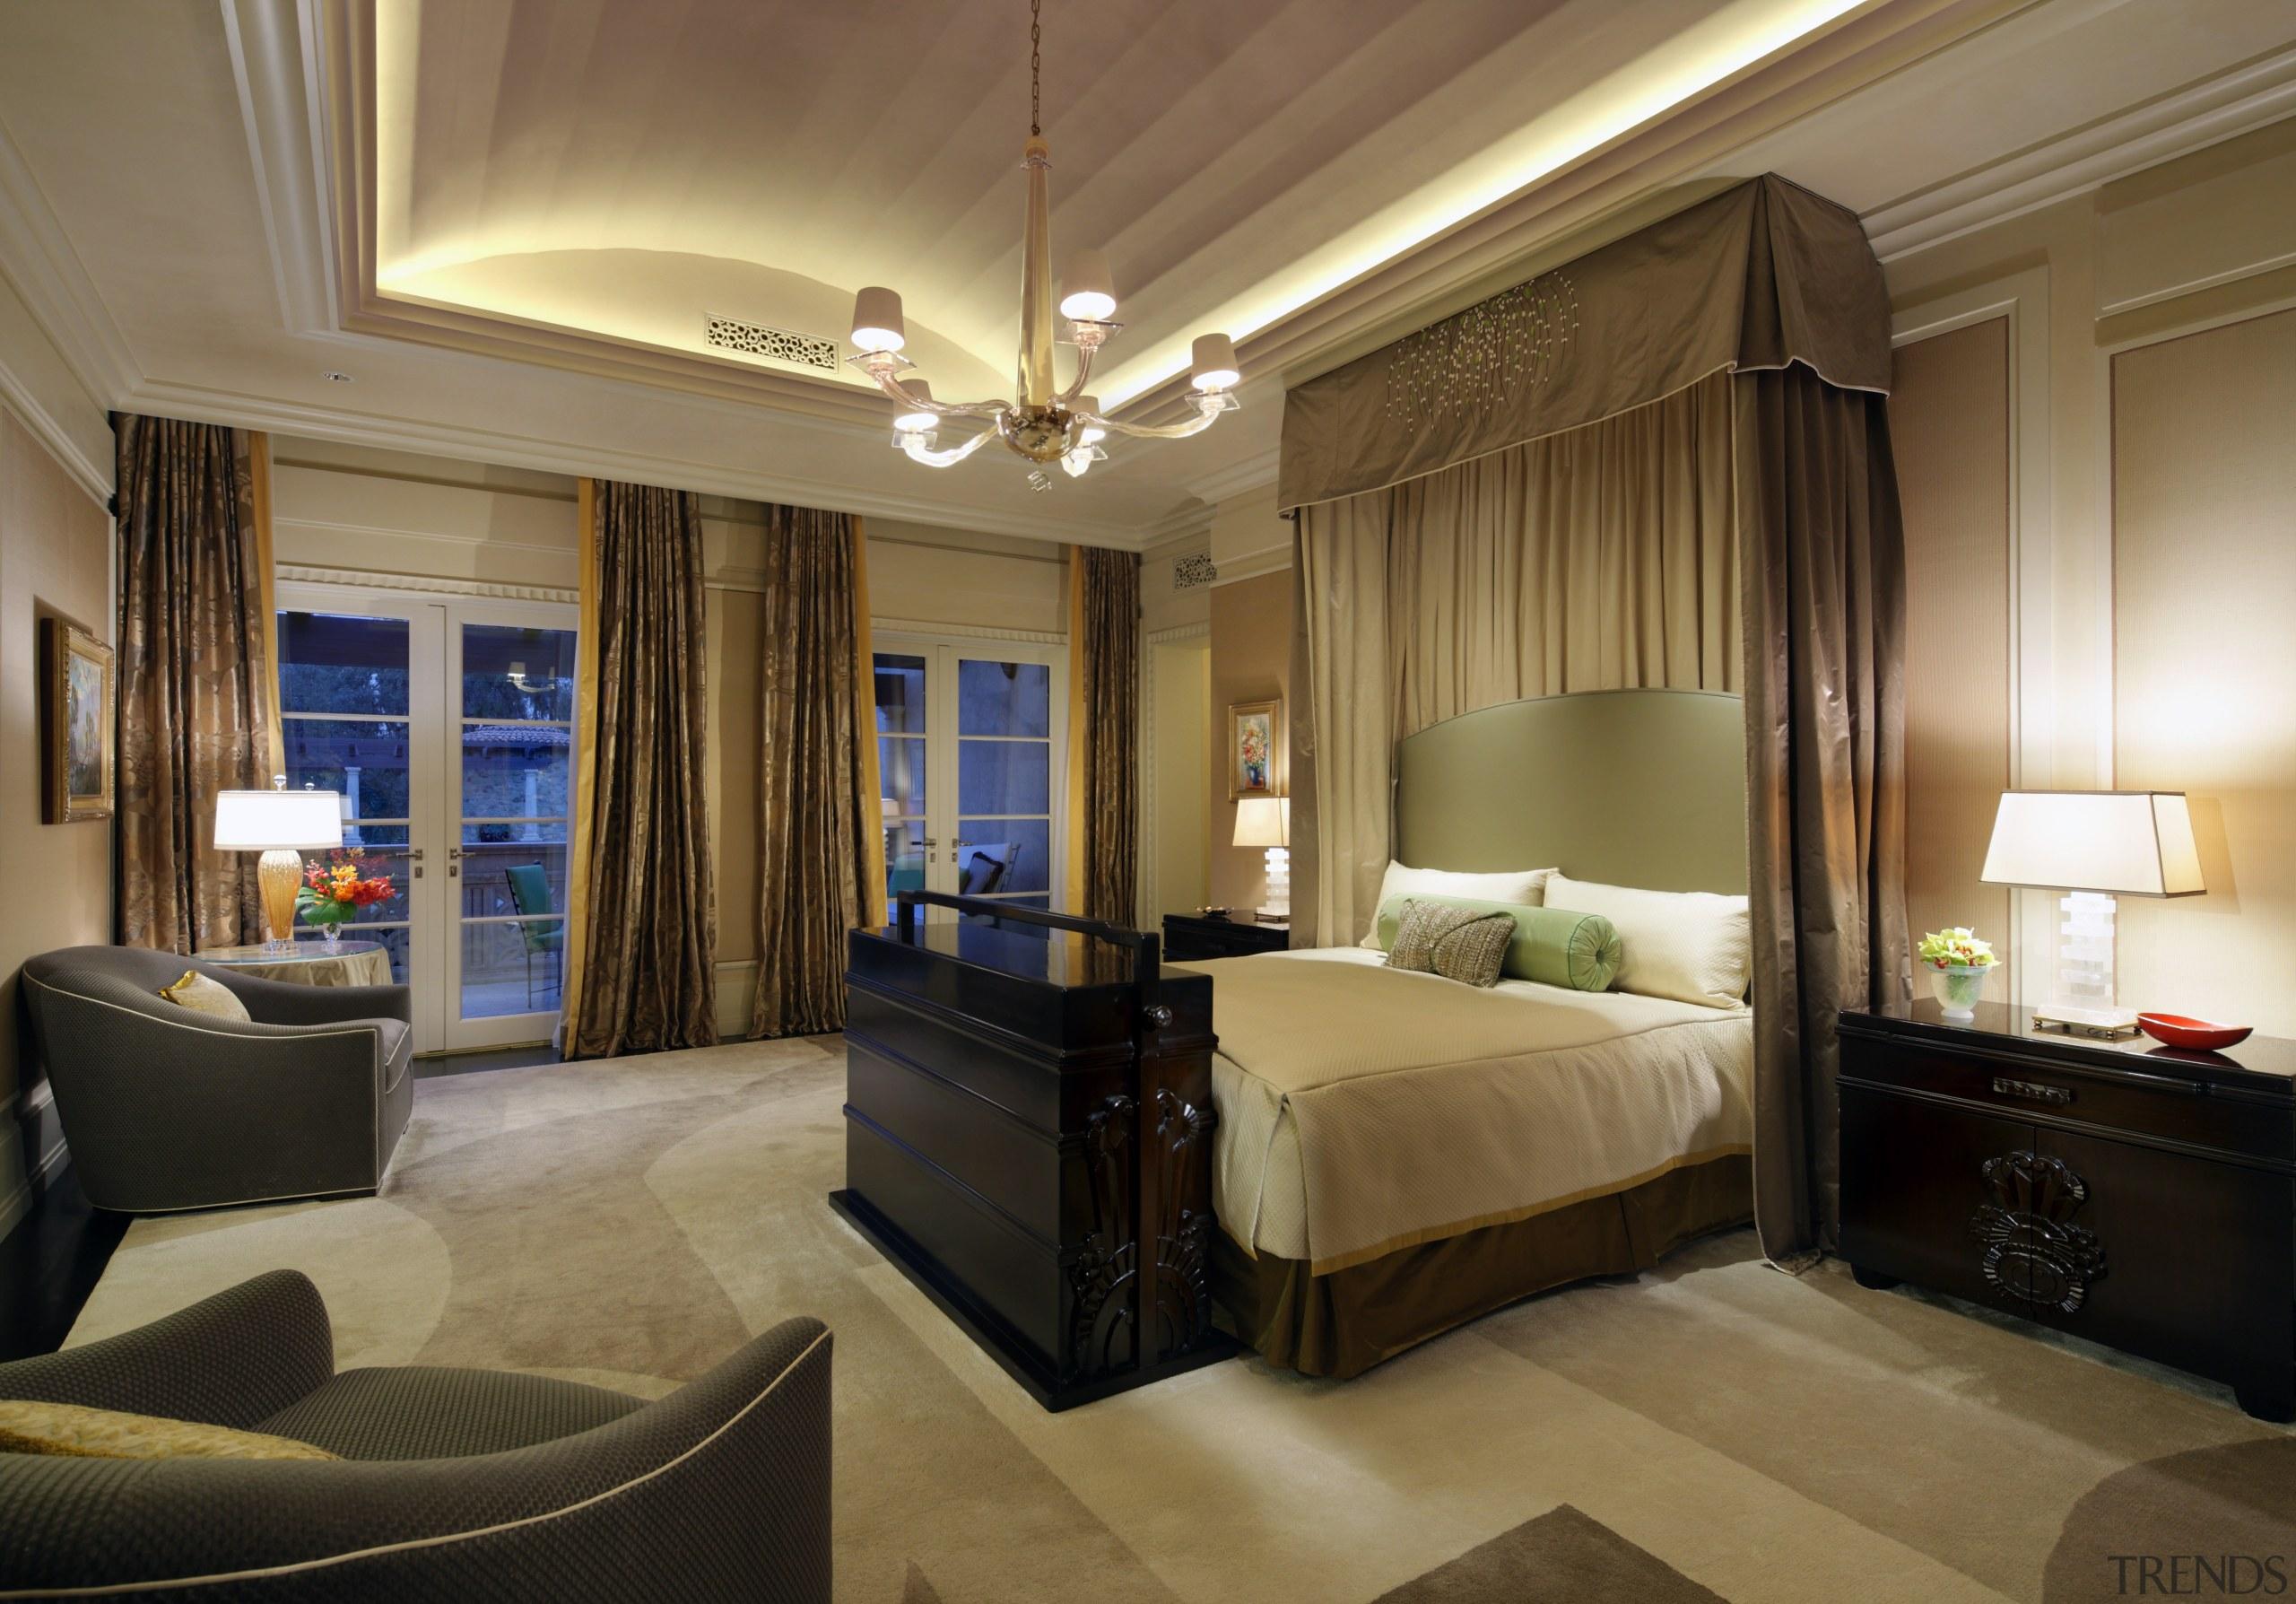 Custom design gives this master suite a lavish bedroom, ceiling, estate, interior design, room, suite, brown, black